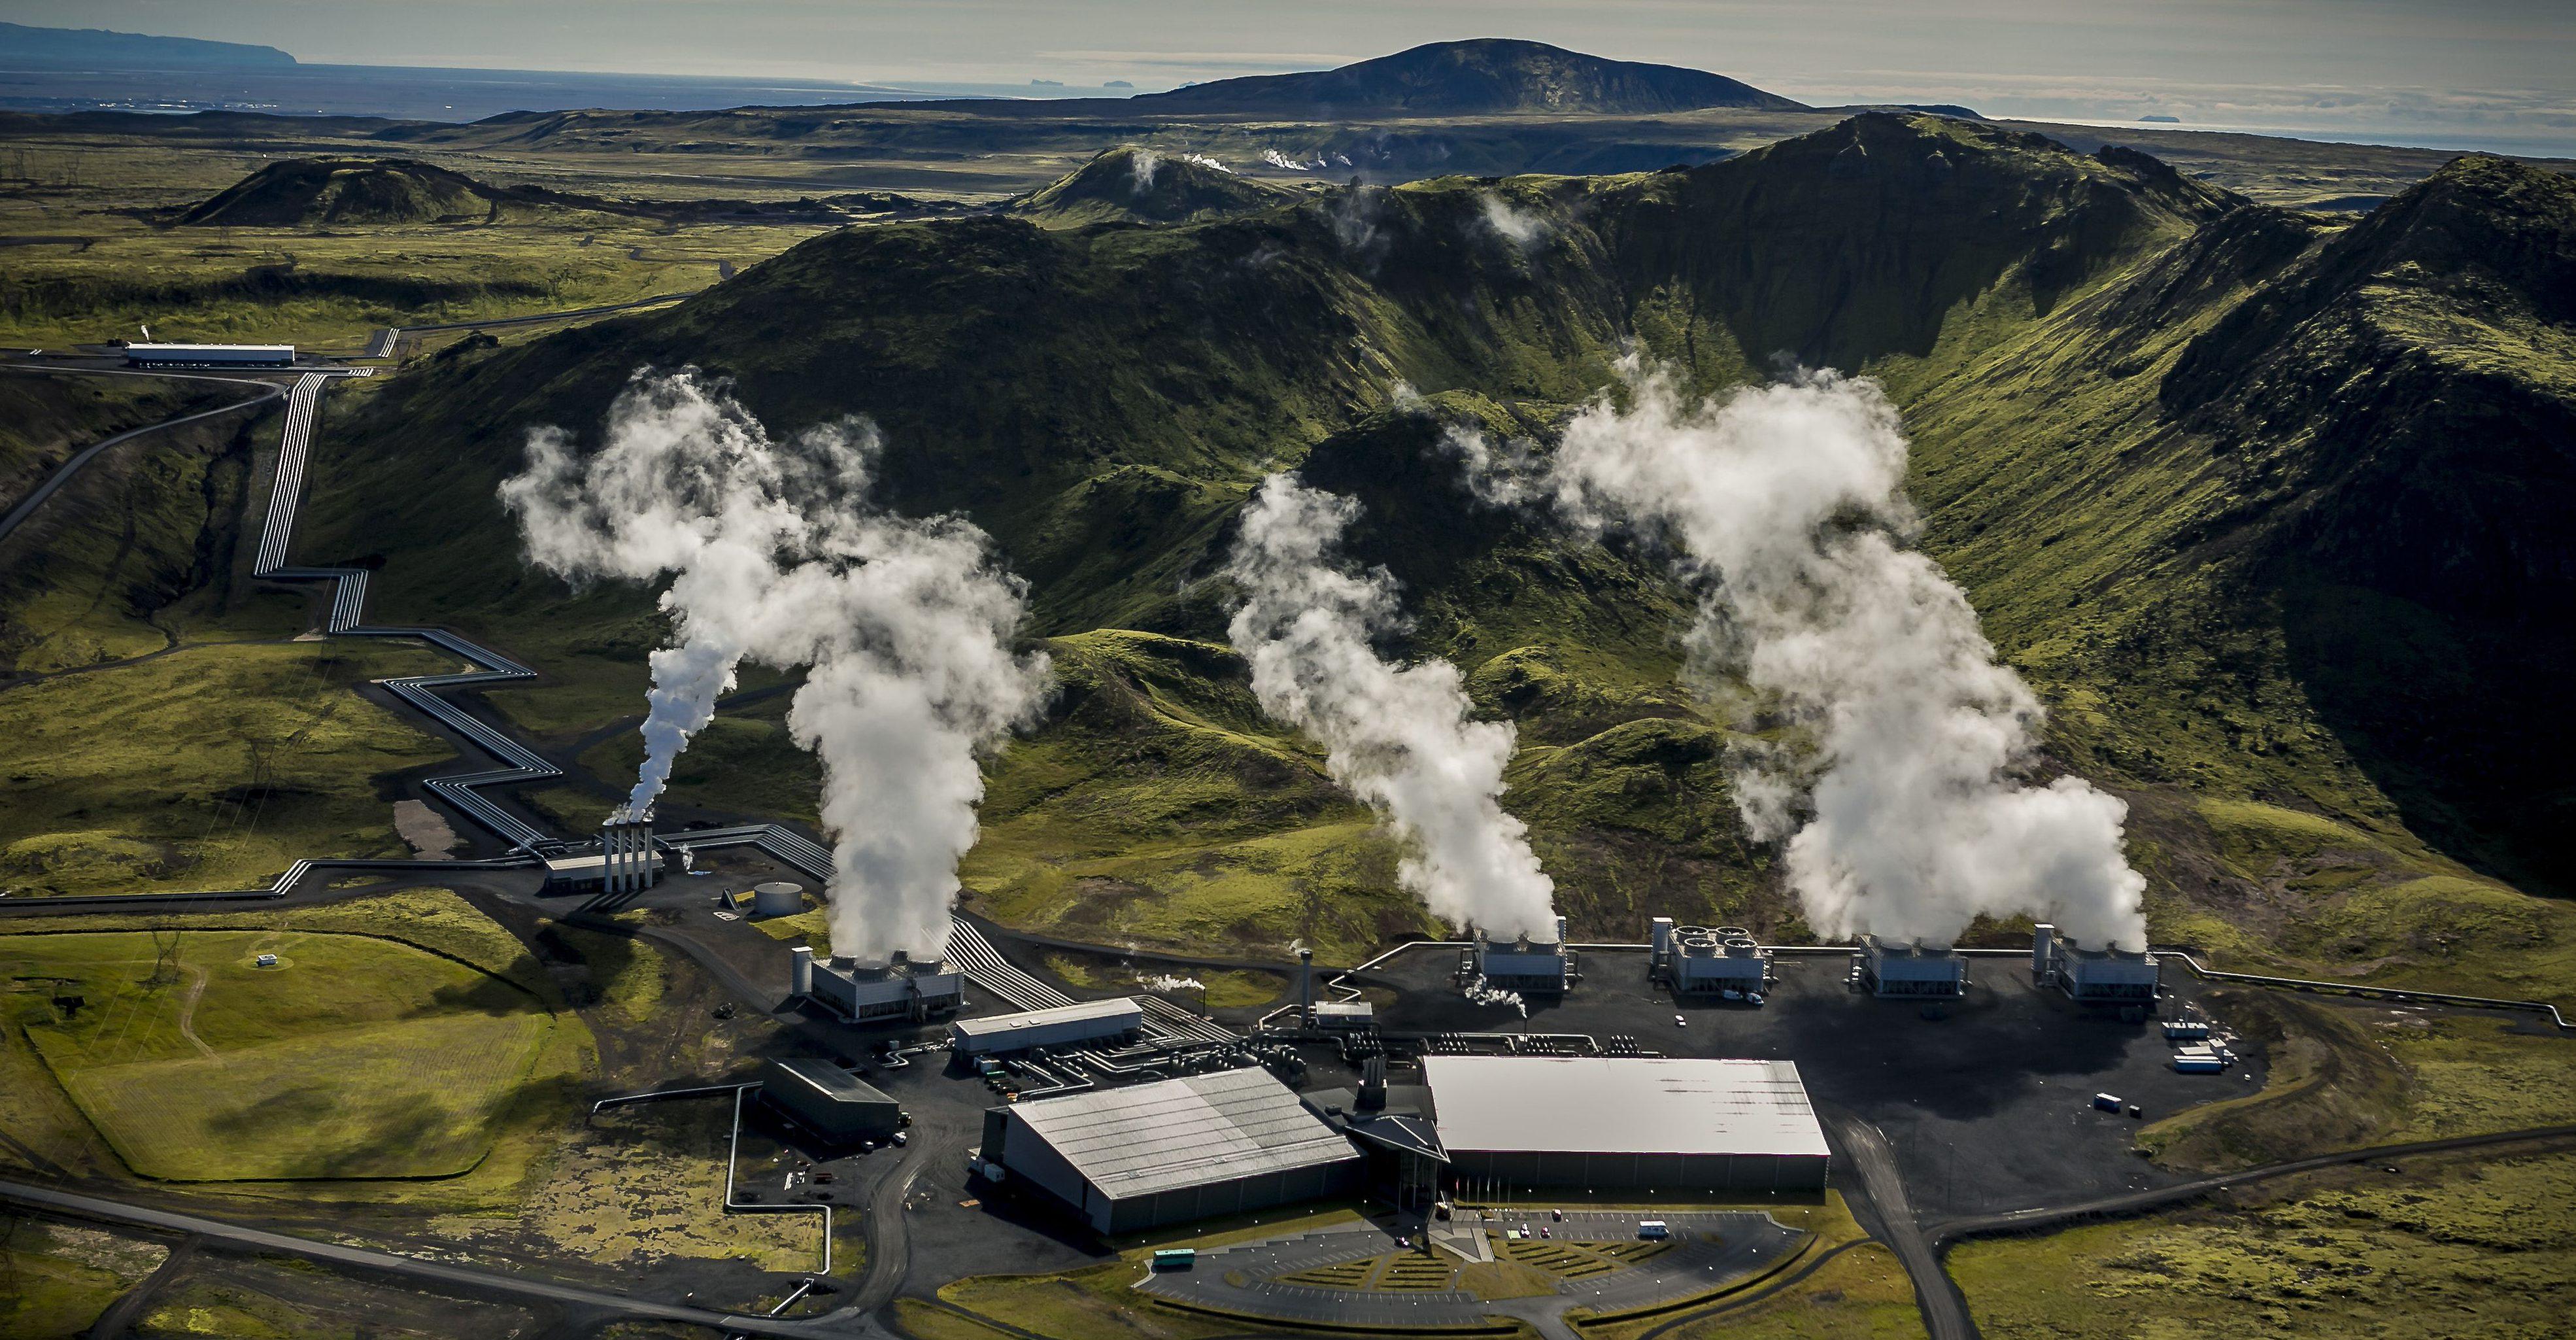 Hellisheidi Power Plant - Photo by Arni Saeberg